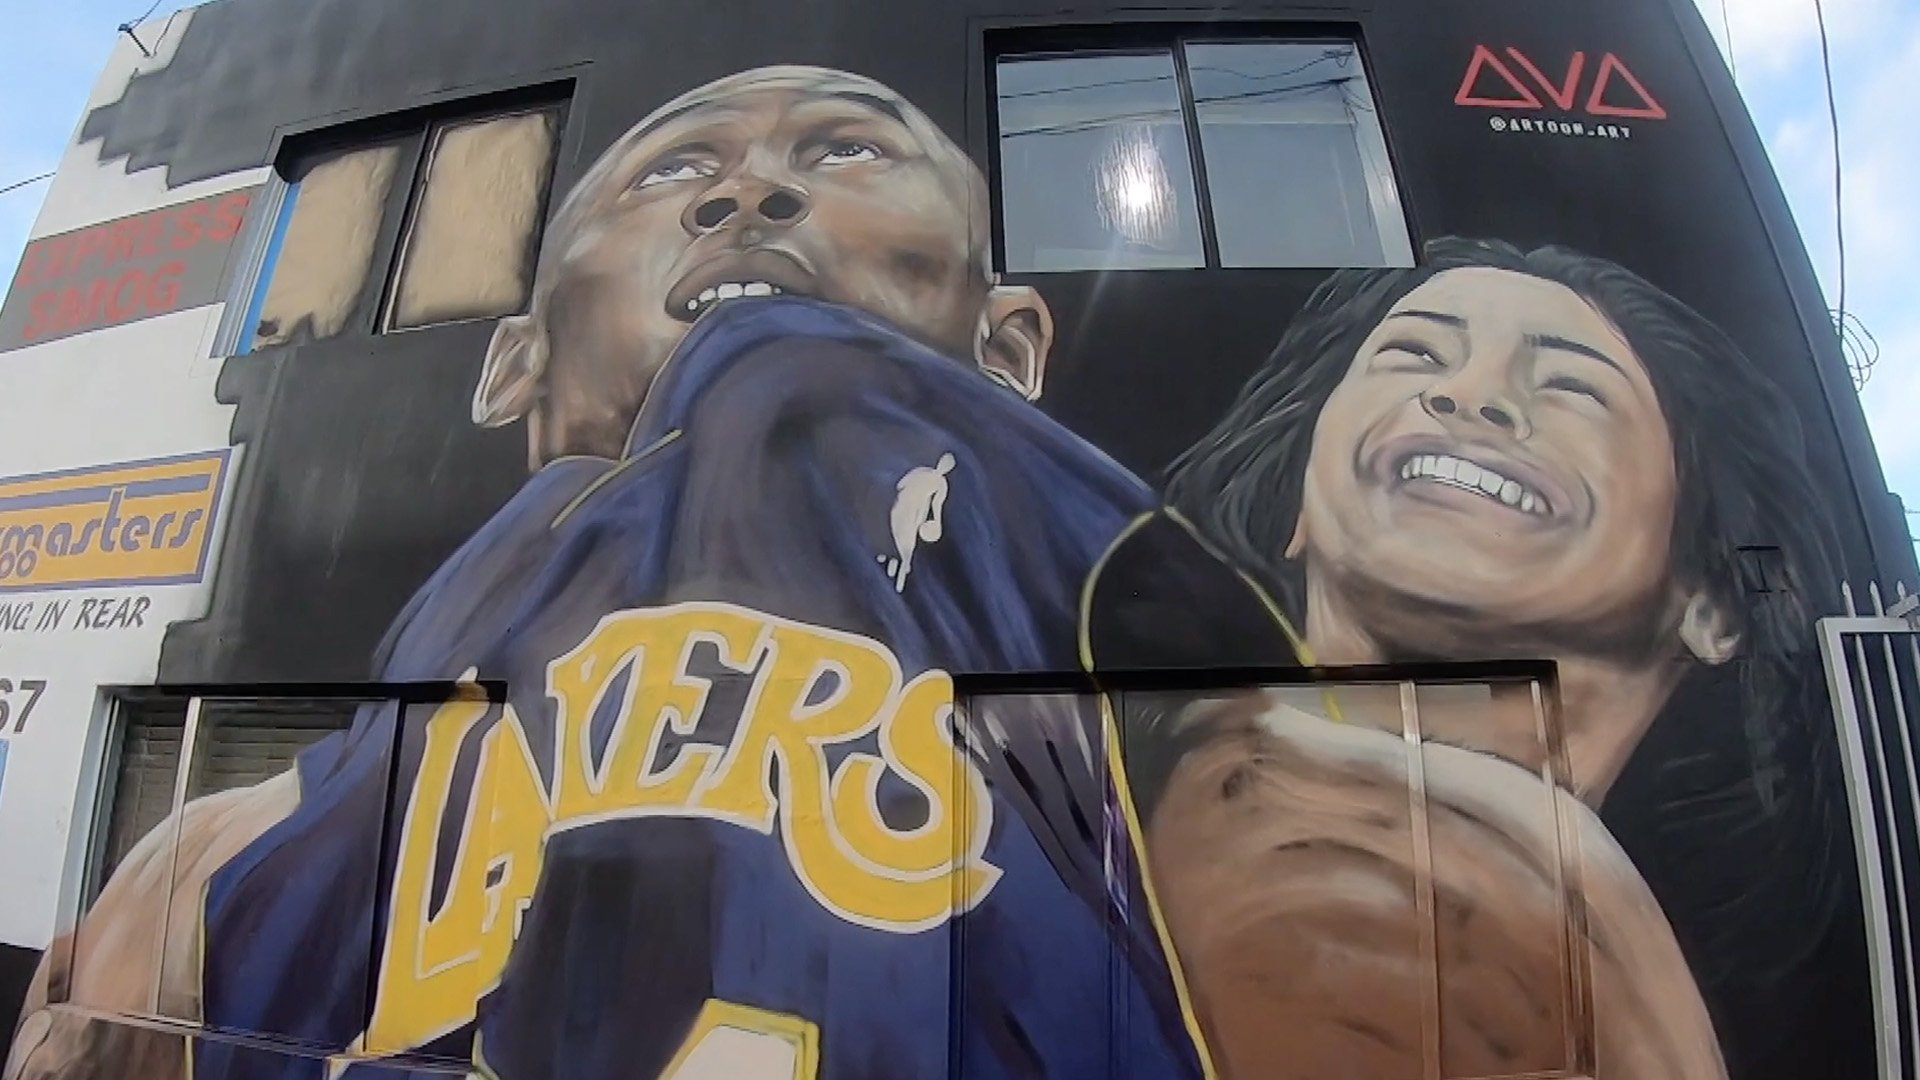 Artist Art Gozukuchikyan painted a mural of Kobe Bryant and his daughter Gianna on Jan. 26, 2020 in Studio City. (Credit: KTLA)